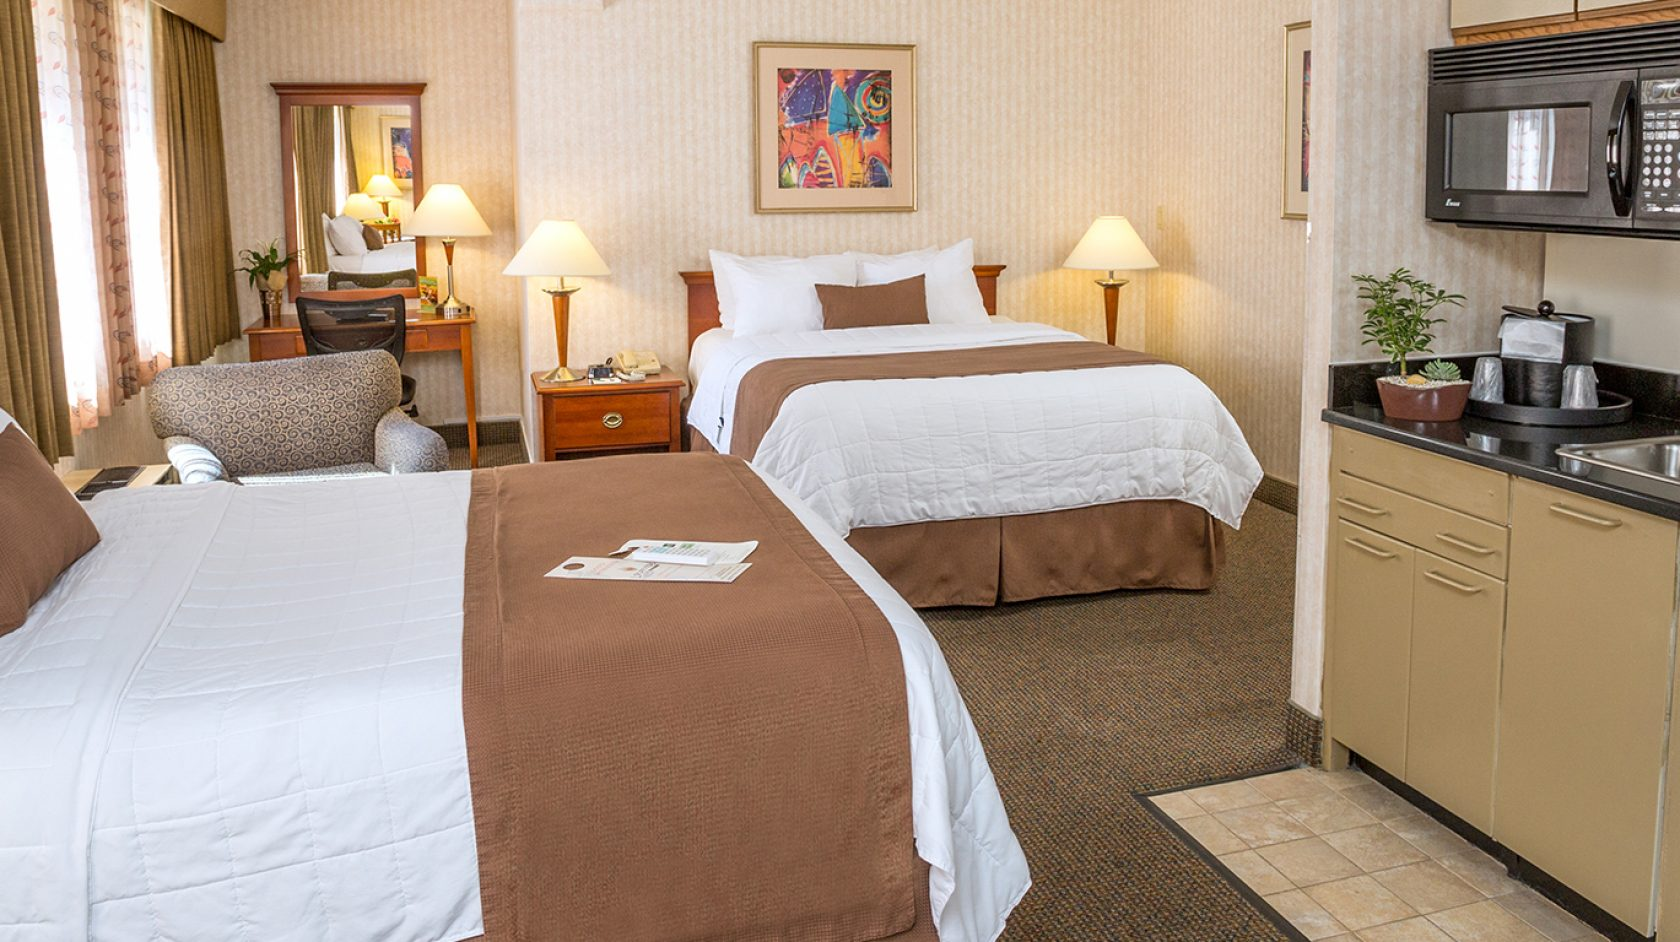 boston hotel reservations inn at longwood medical. Black Bedroom Furniture Sets. Home Design Ideas